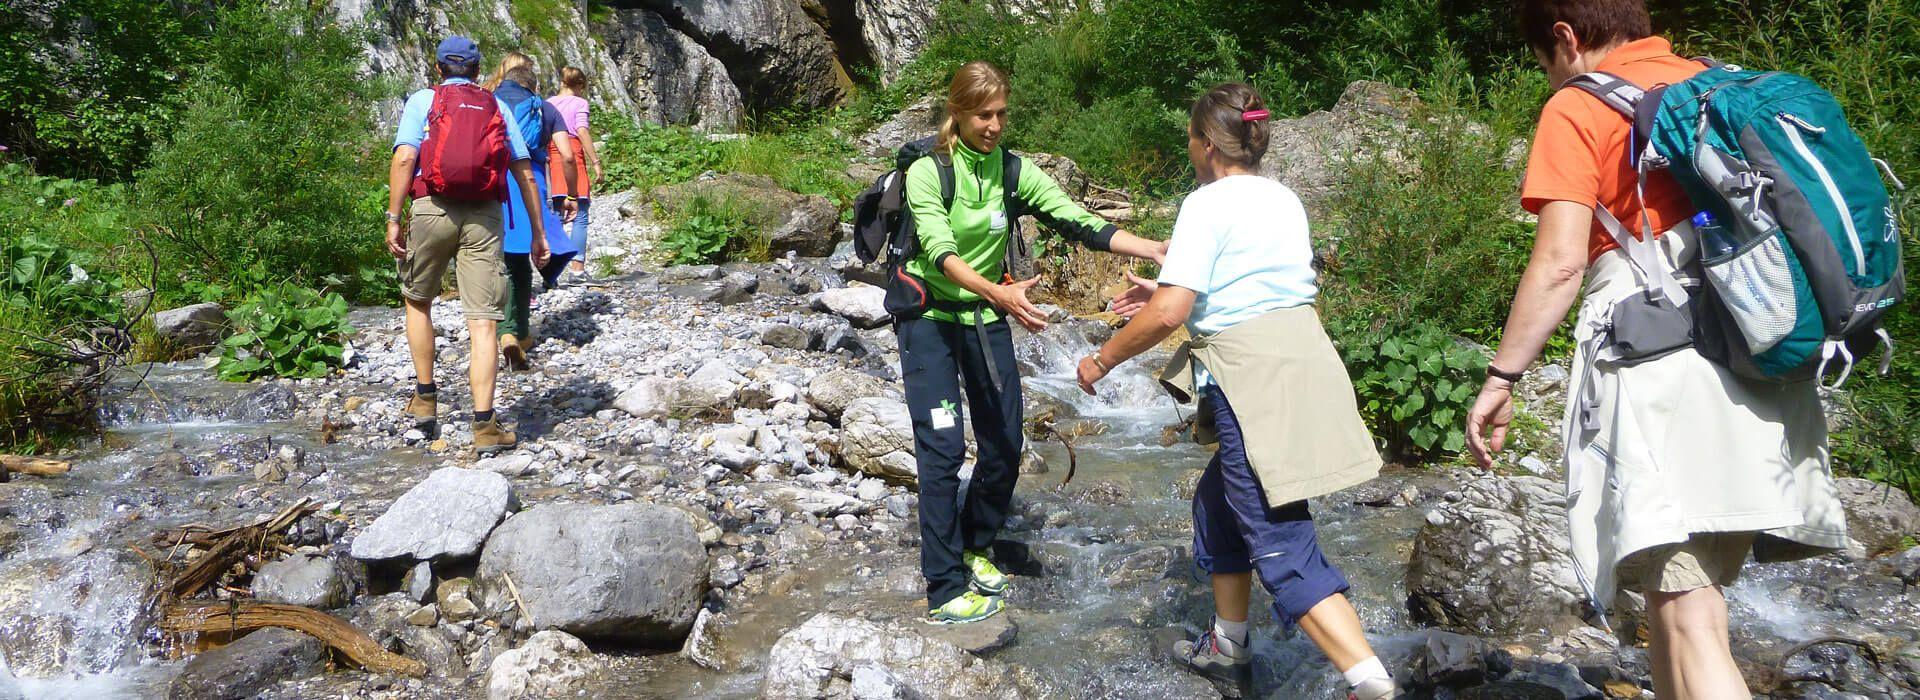 Flussquerung bei einer Naturführung